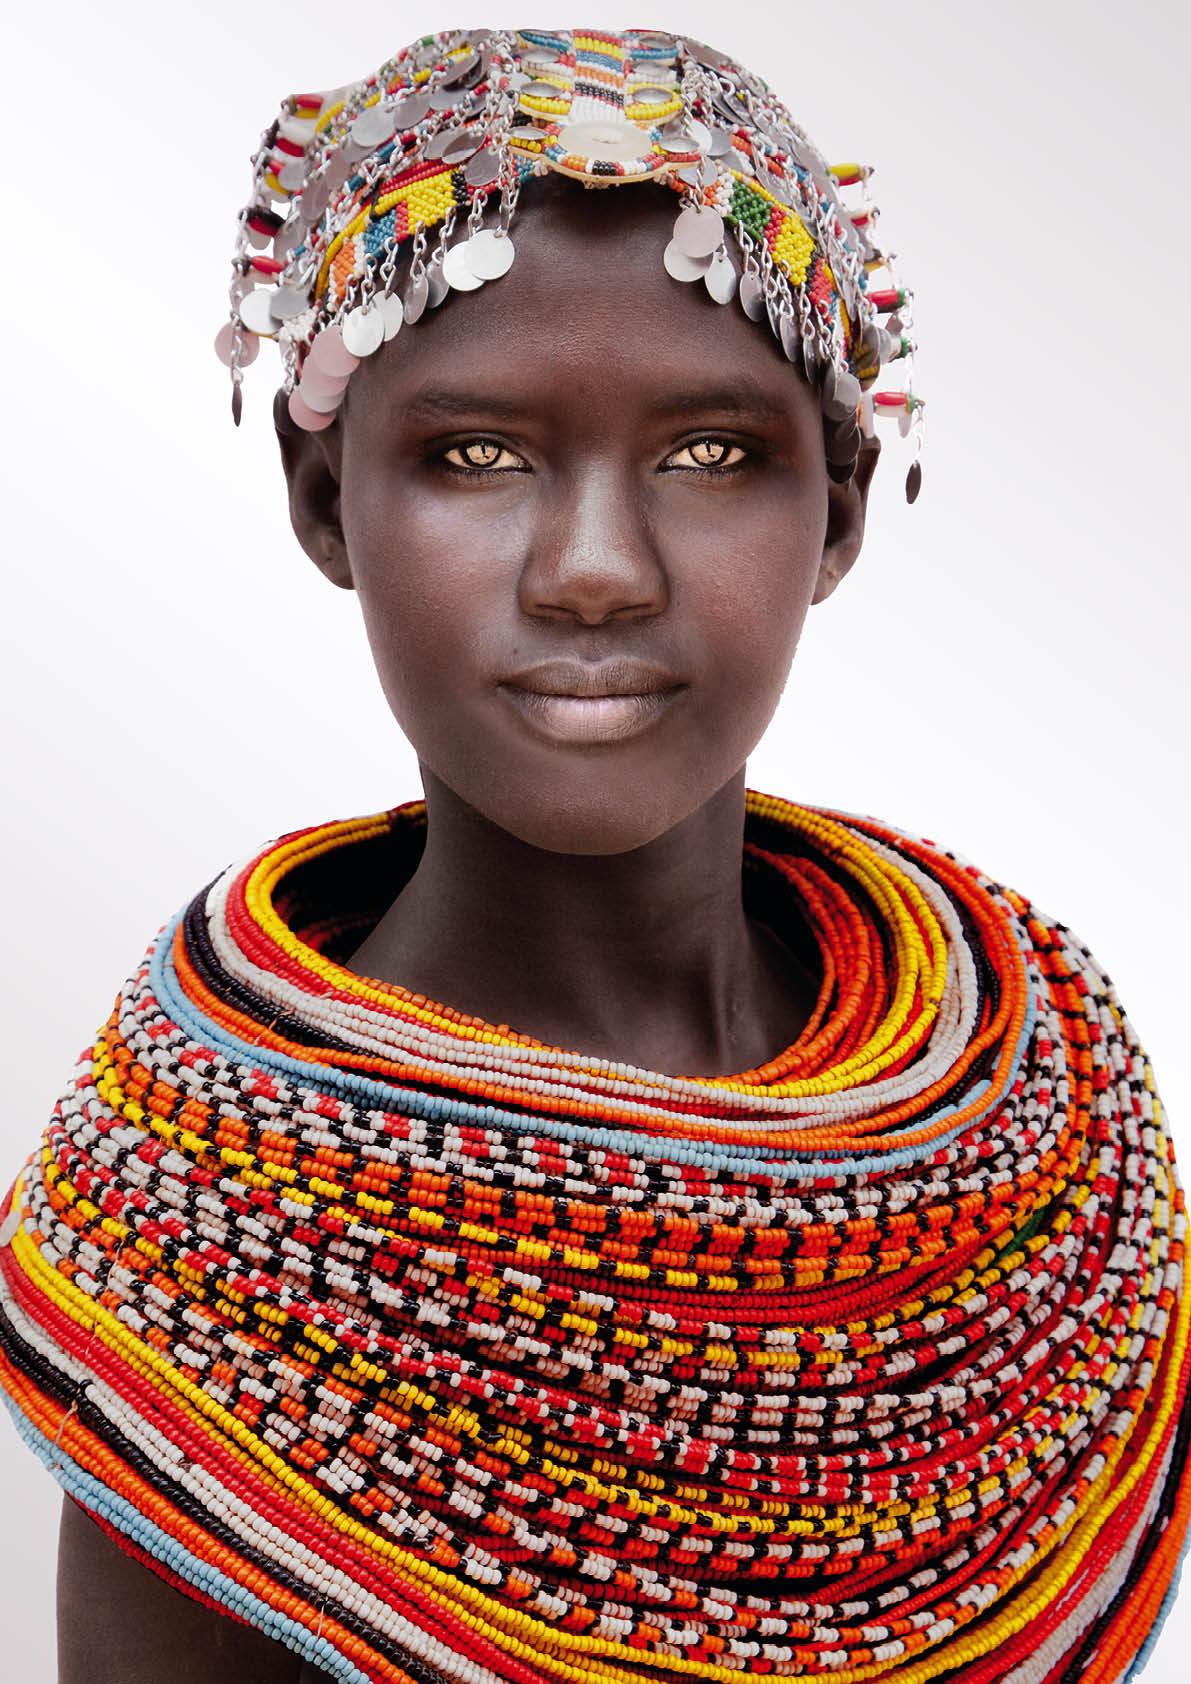 Samburu vrouw met hoofdsieraad en halssieraad. Foto met dank aan Museum Volkenkunde, Mario Gerth©